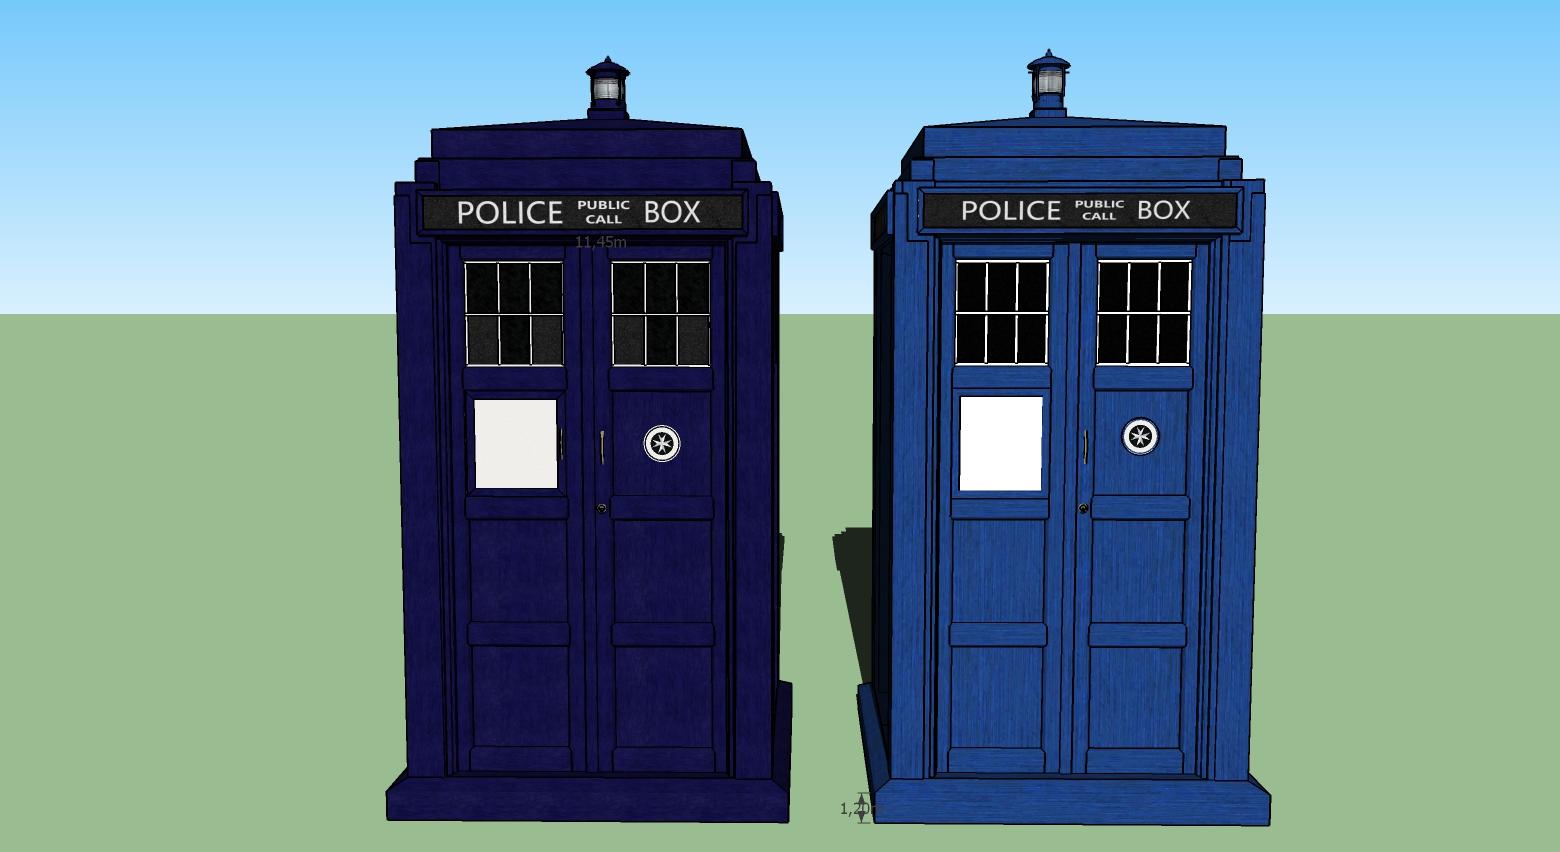 tardis series 5 vs series 10 1.jpg